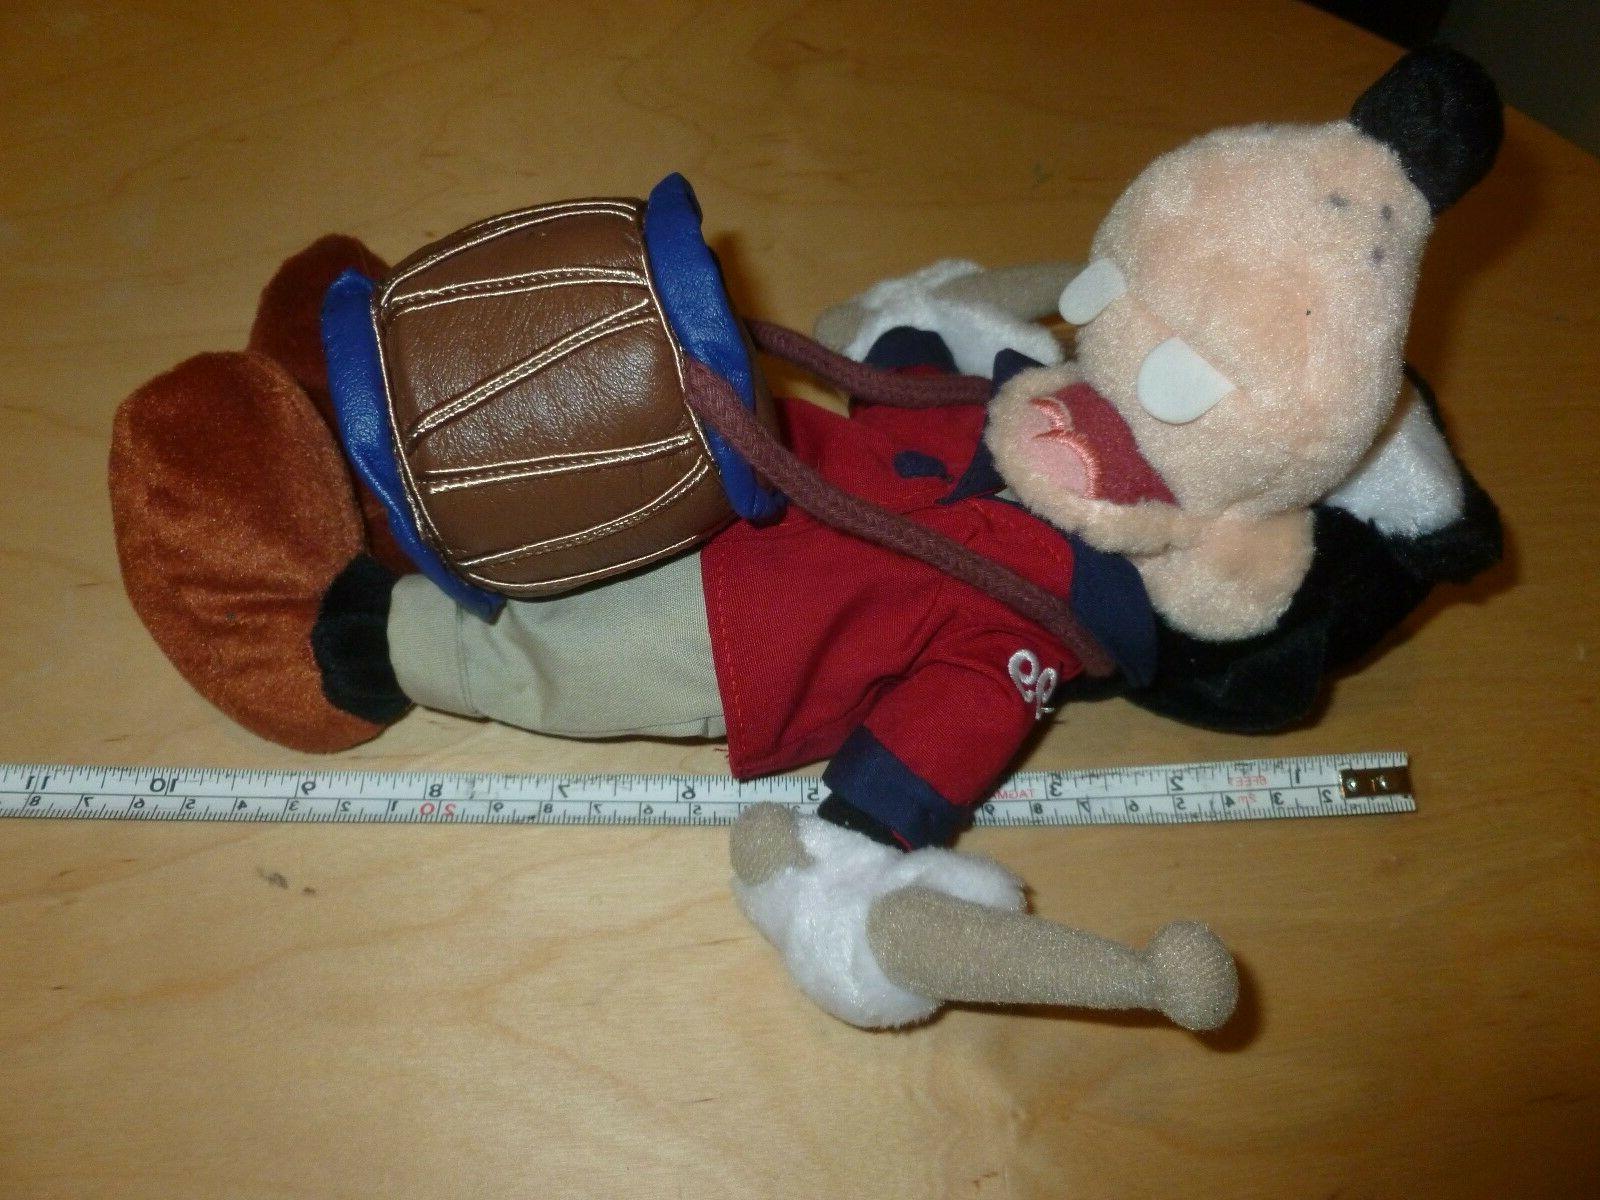 "1999 Disney 4th of July GOOFY Drum Bean Plush Stuffed 9"" NWT"